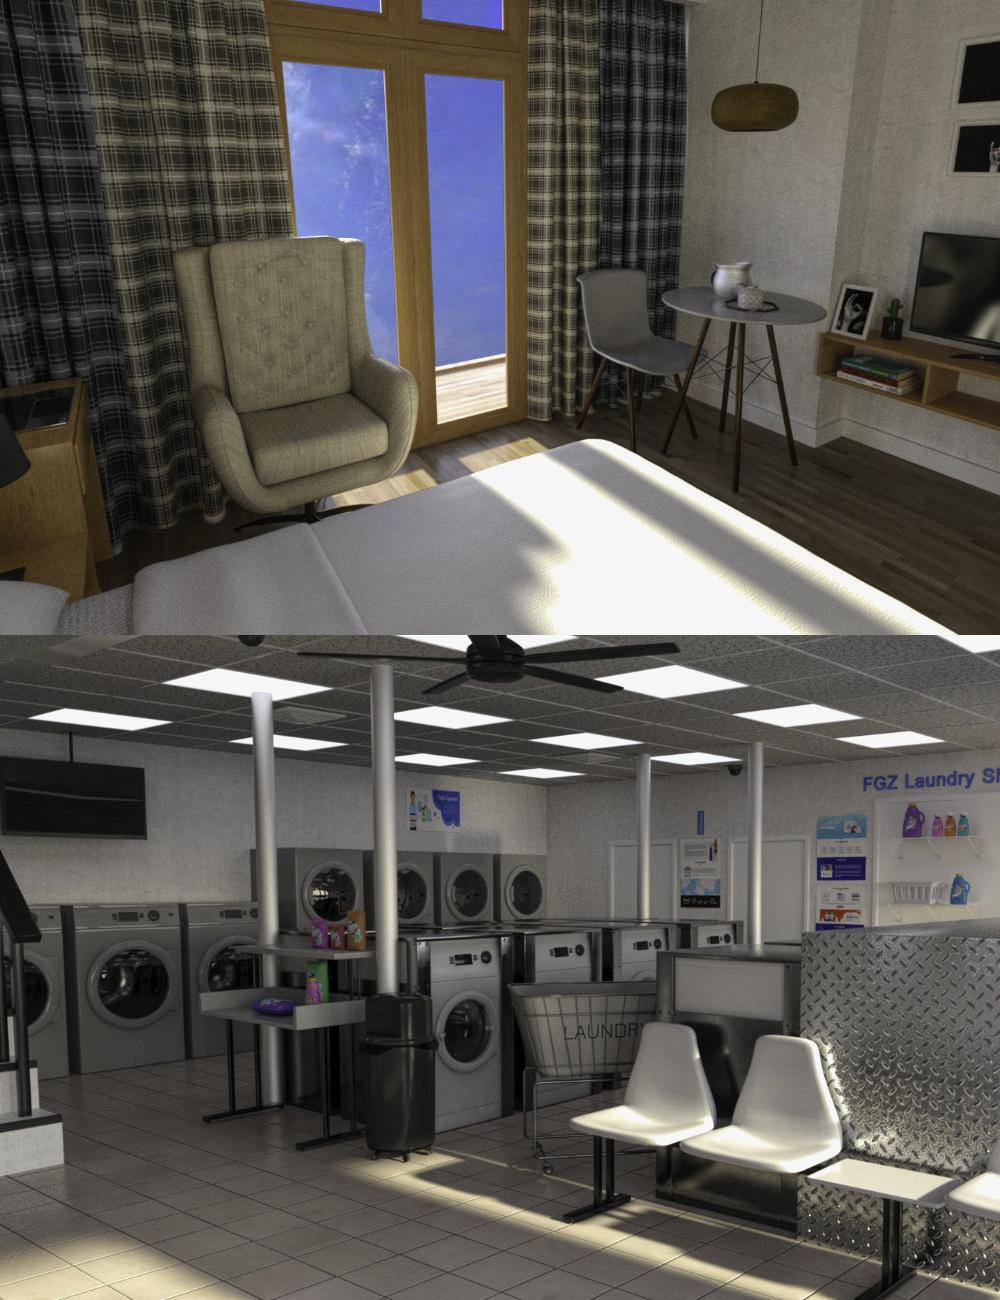 FG Apartment and Laundry Shop by: Fugazi1968PAN StudiosIronman, 3D Models by Daz 3D